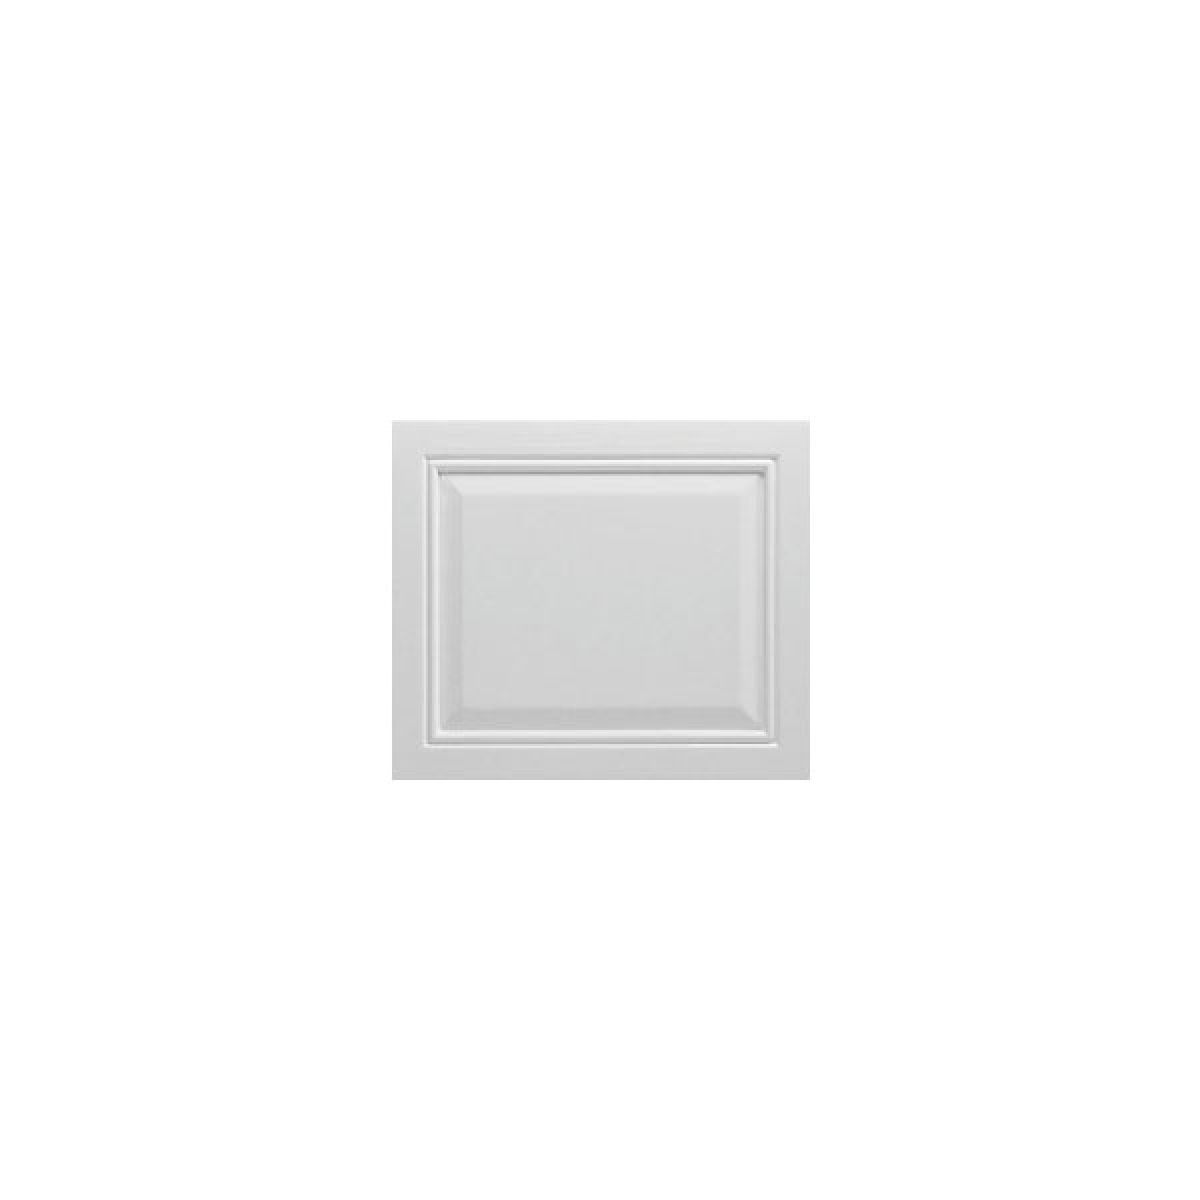 Moods Tudor Gloss White Acrylic Bath End Panel 700mm